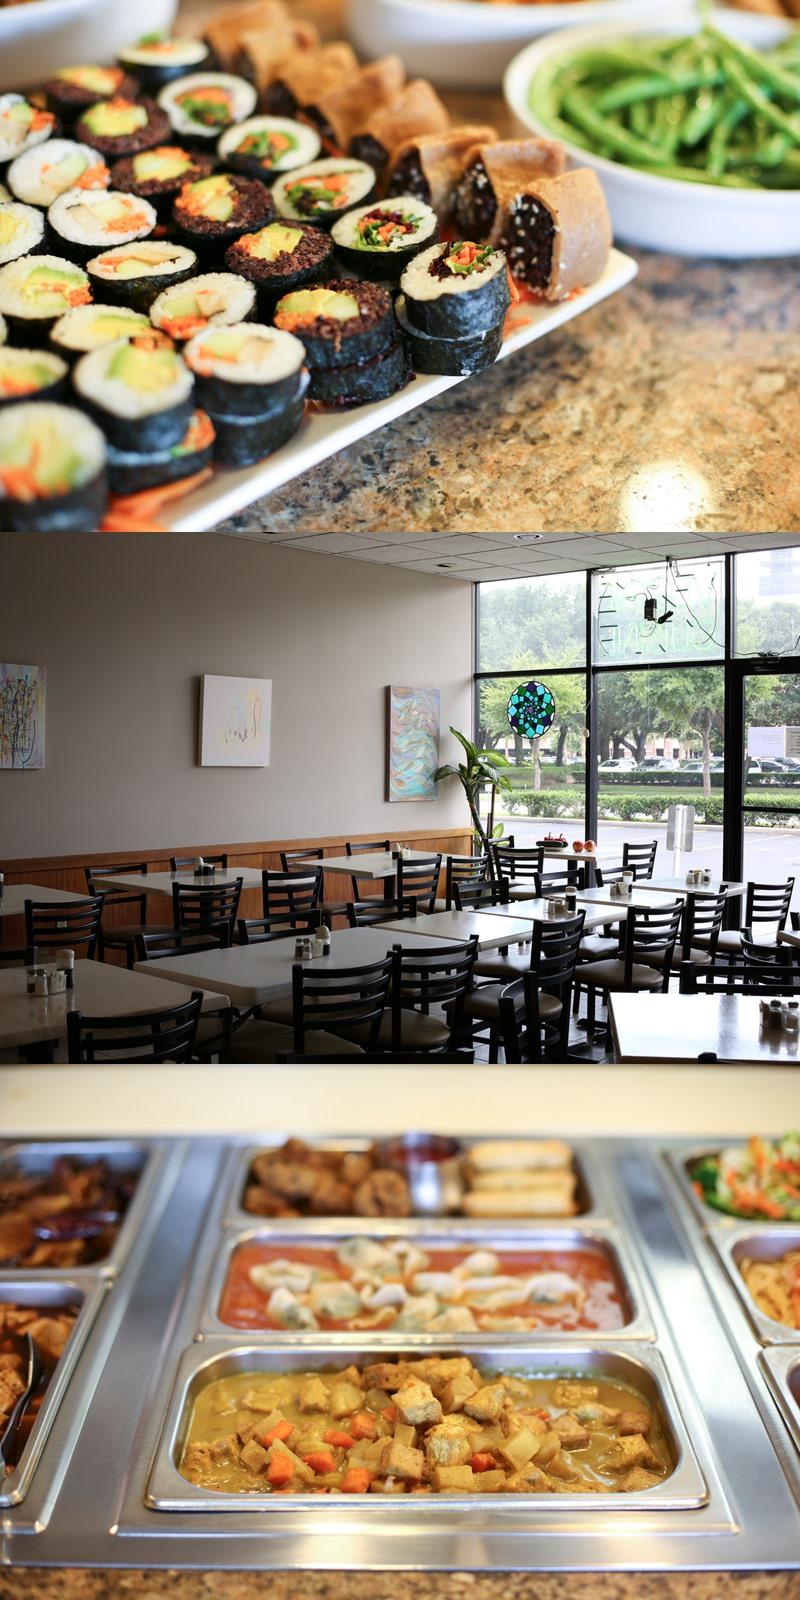 Pepper Tree in Houston, TX is an all-vegan Asian food restaurant